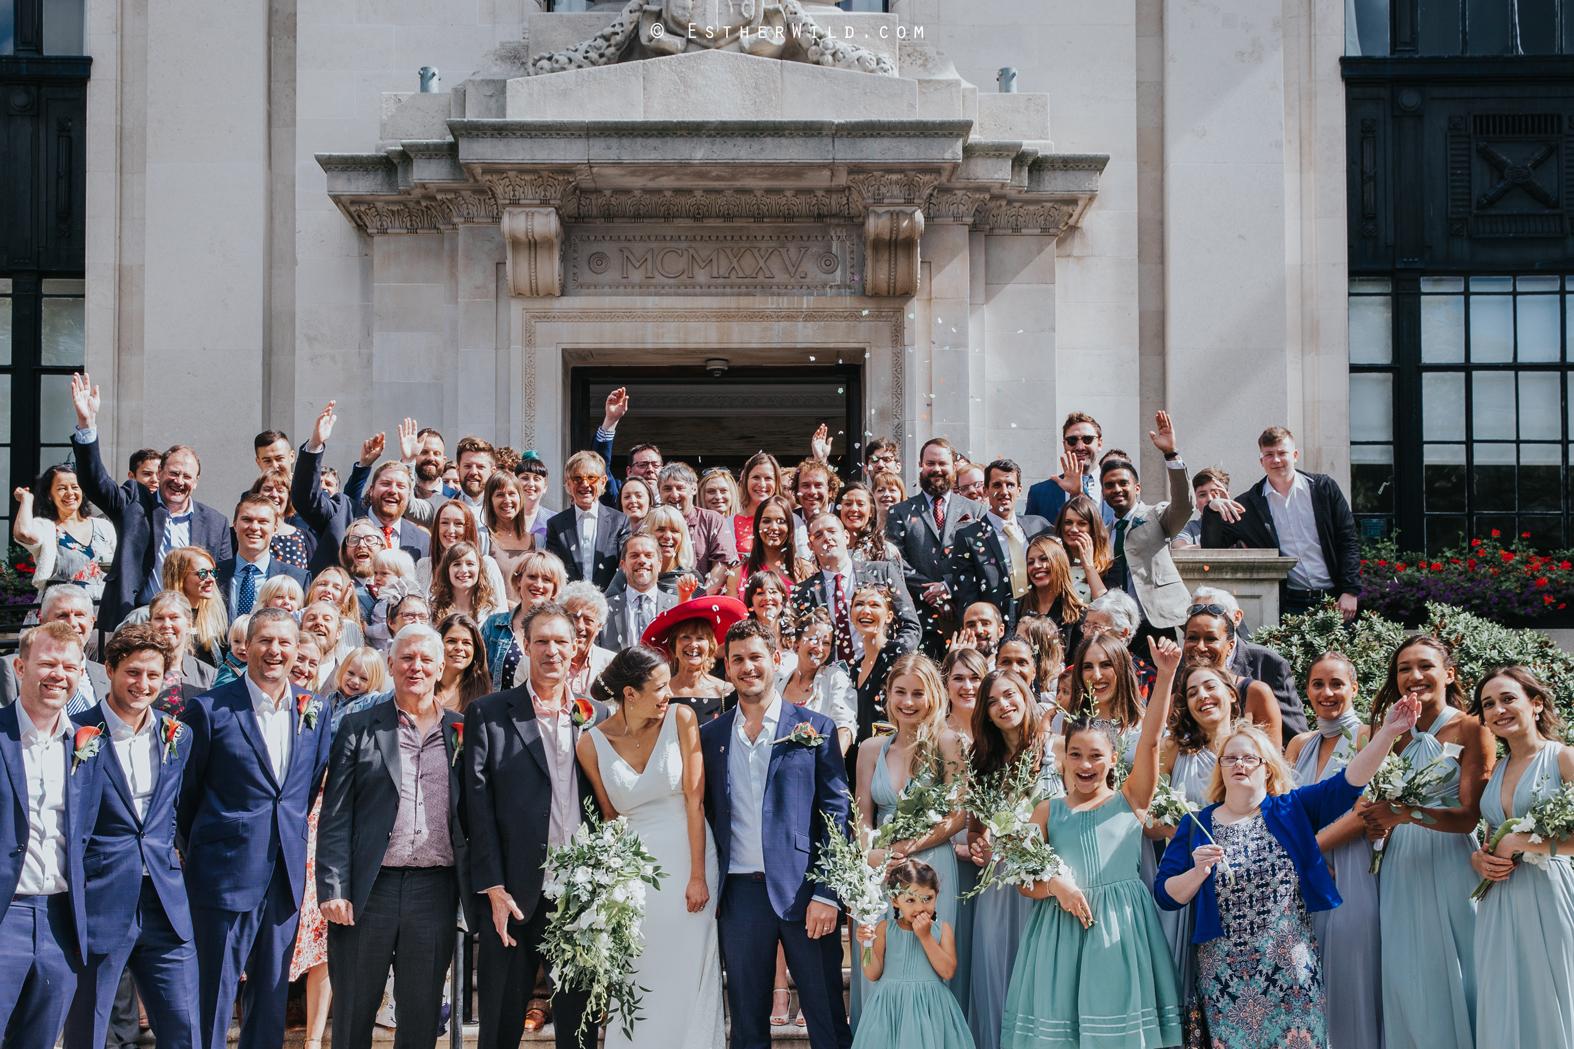 Islington_Town_Hall_Wedding_London_Photographer_Esther_Wild_IMG_5316.jpg